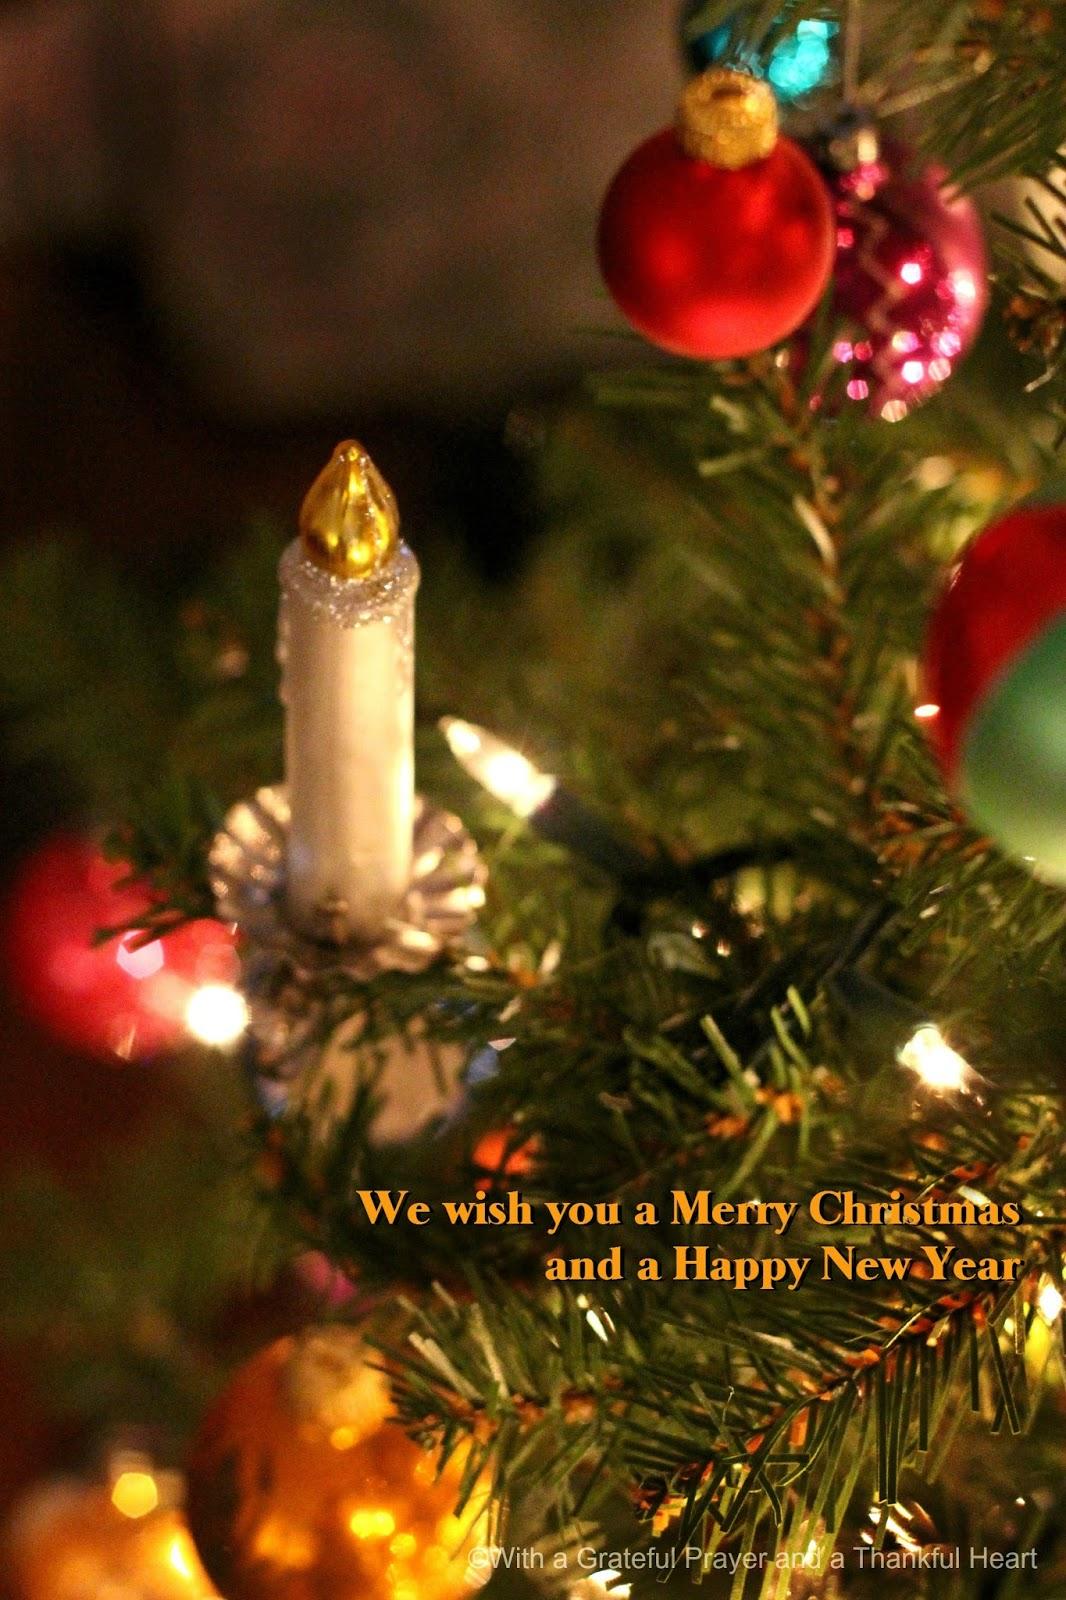 Christmas At Home Grateful Prayer Thankful Heart